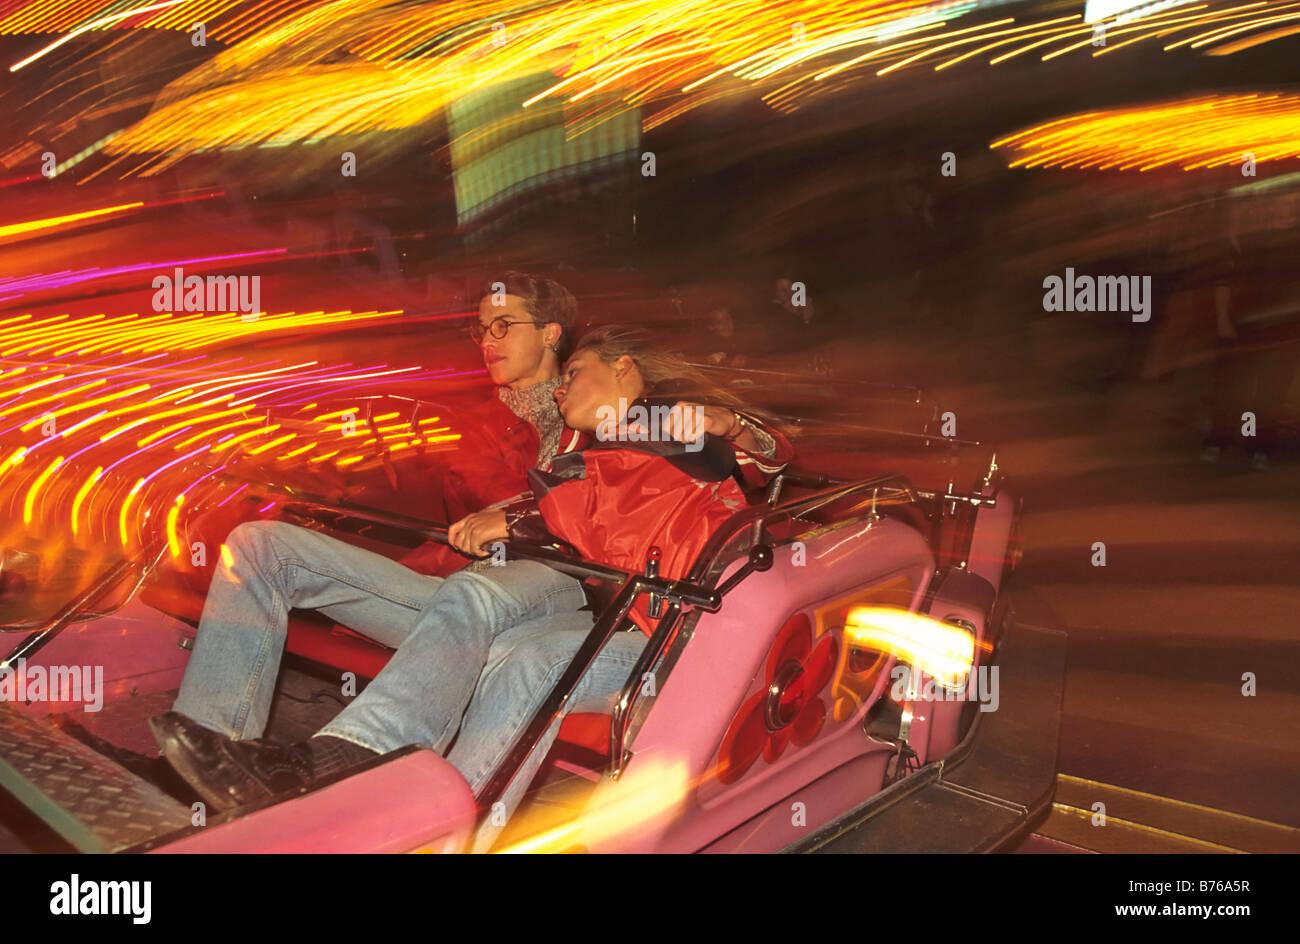 october festival fairground ride munich folk festival bavaria germany sight Stock Photo